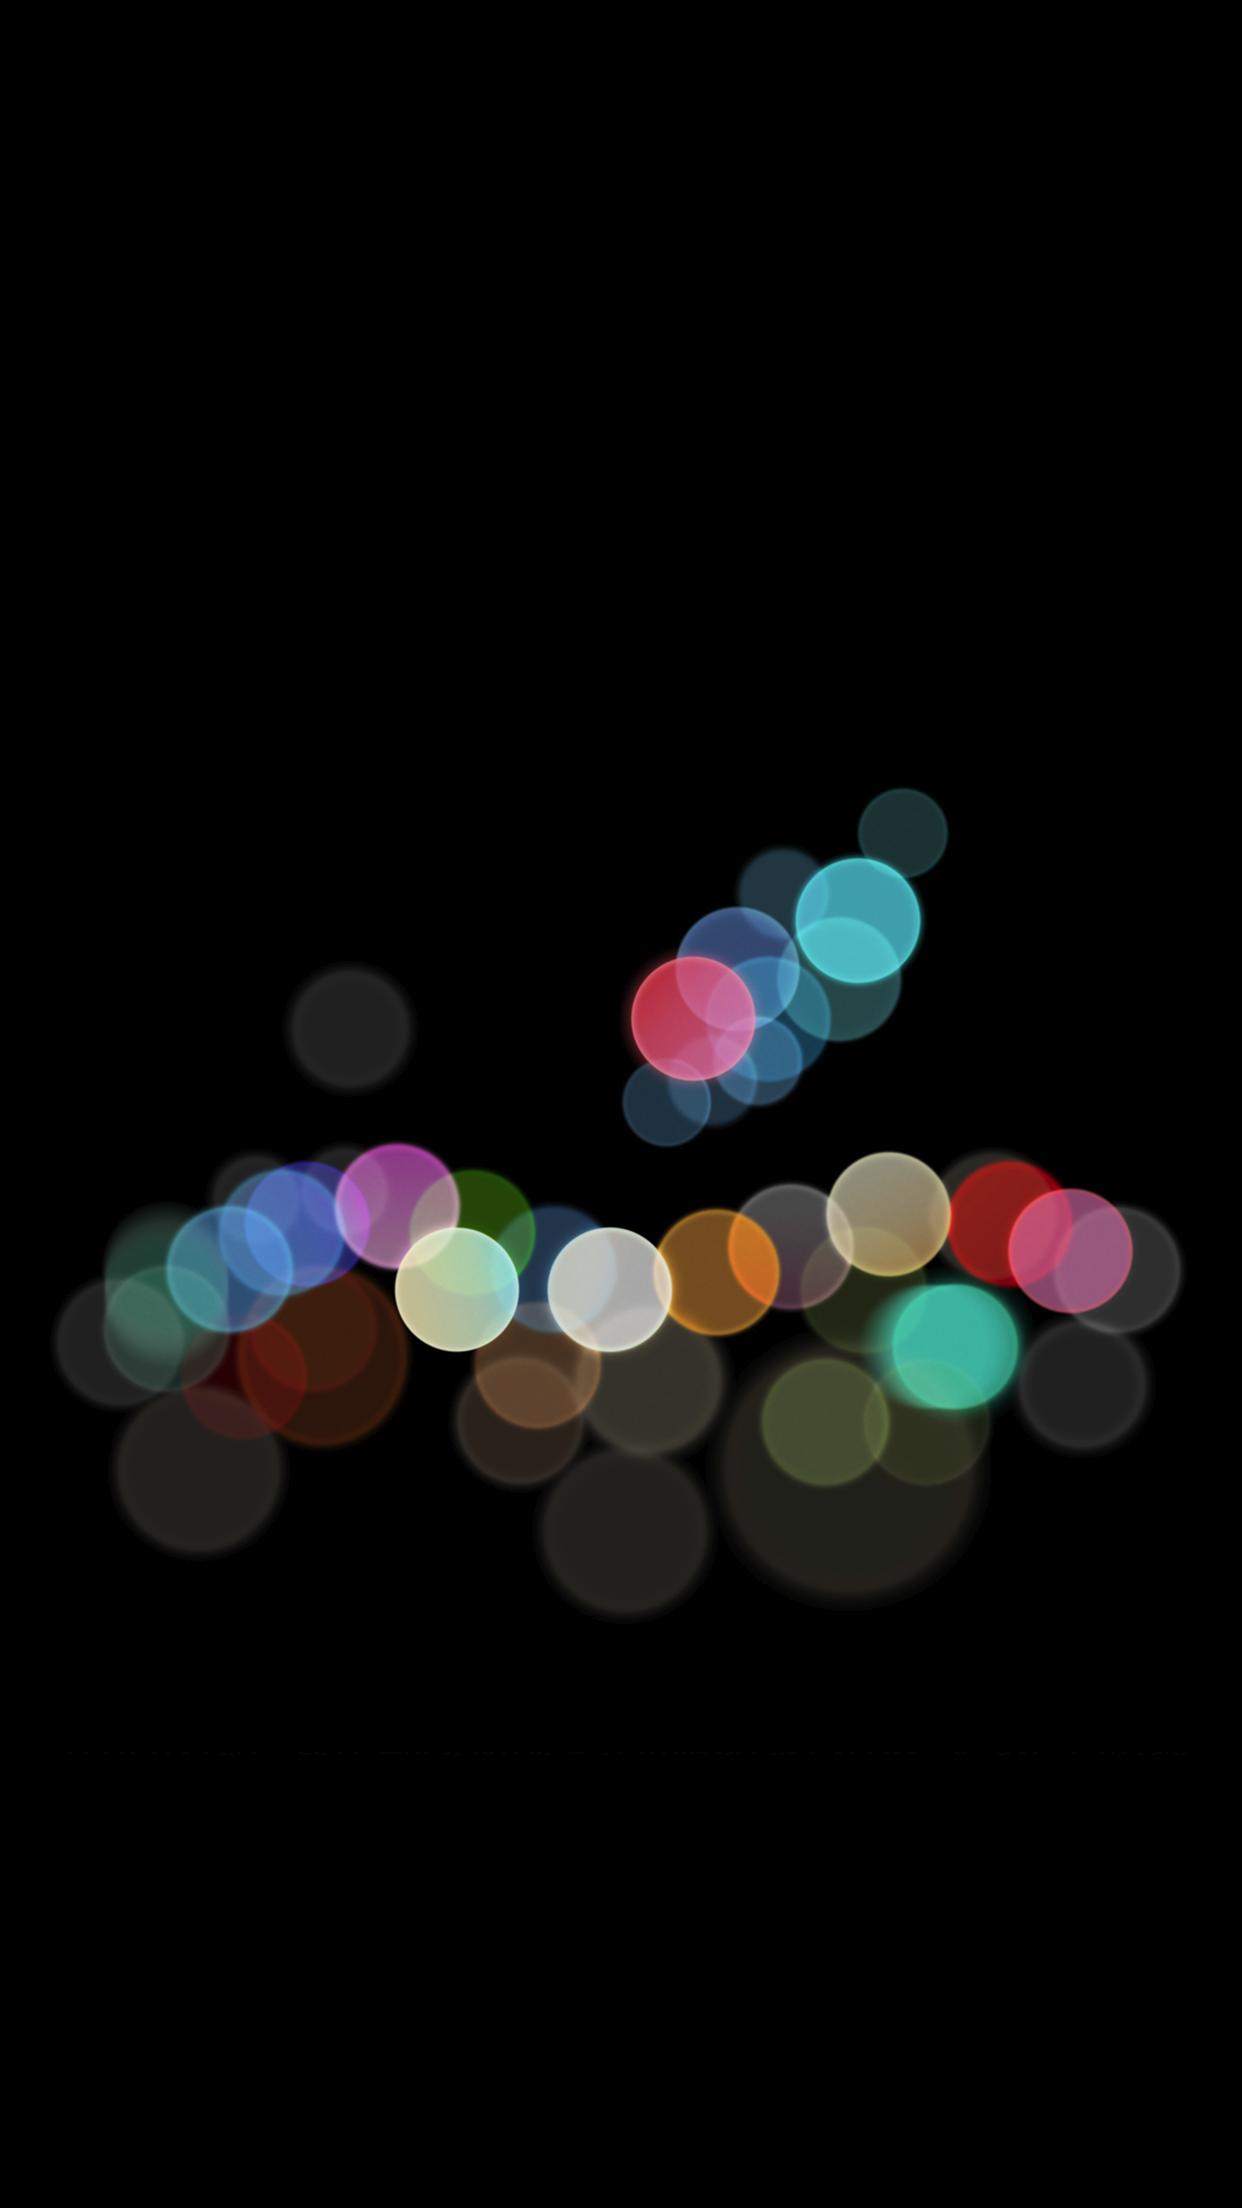 Keynote 2016 Keynote Logo 1 3Wallpapers iPhone Parallax Apple Keynote logo 1